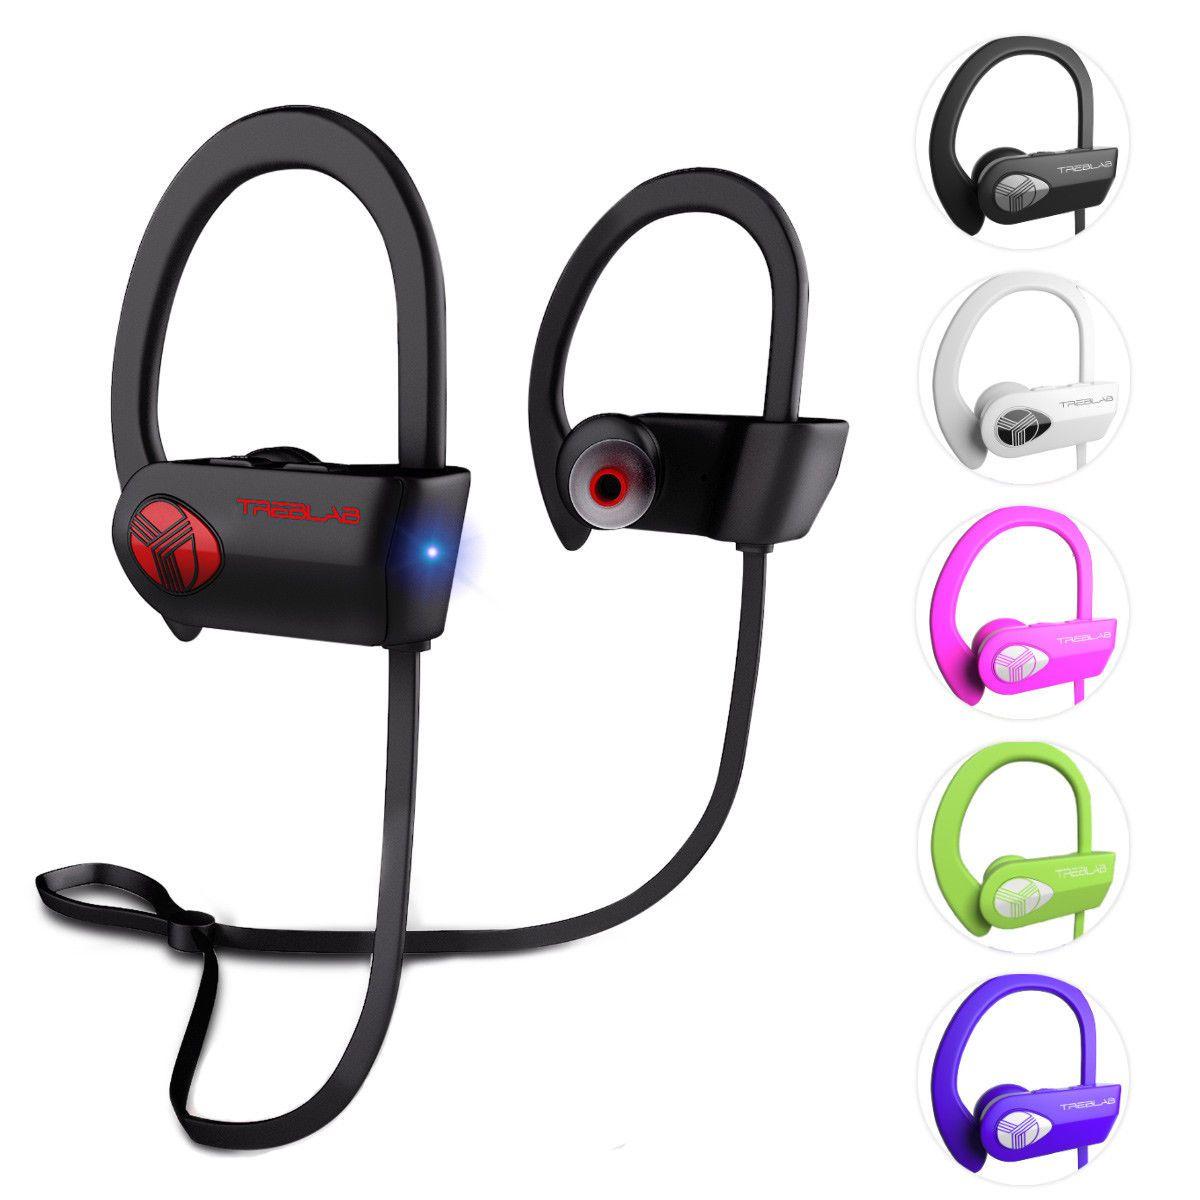 Details about TREBLAB XR500 Bluetooth Headphones Best